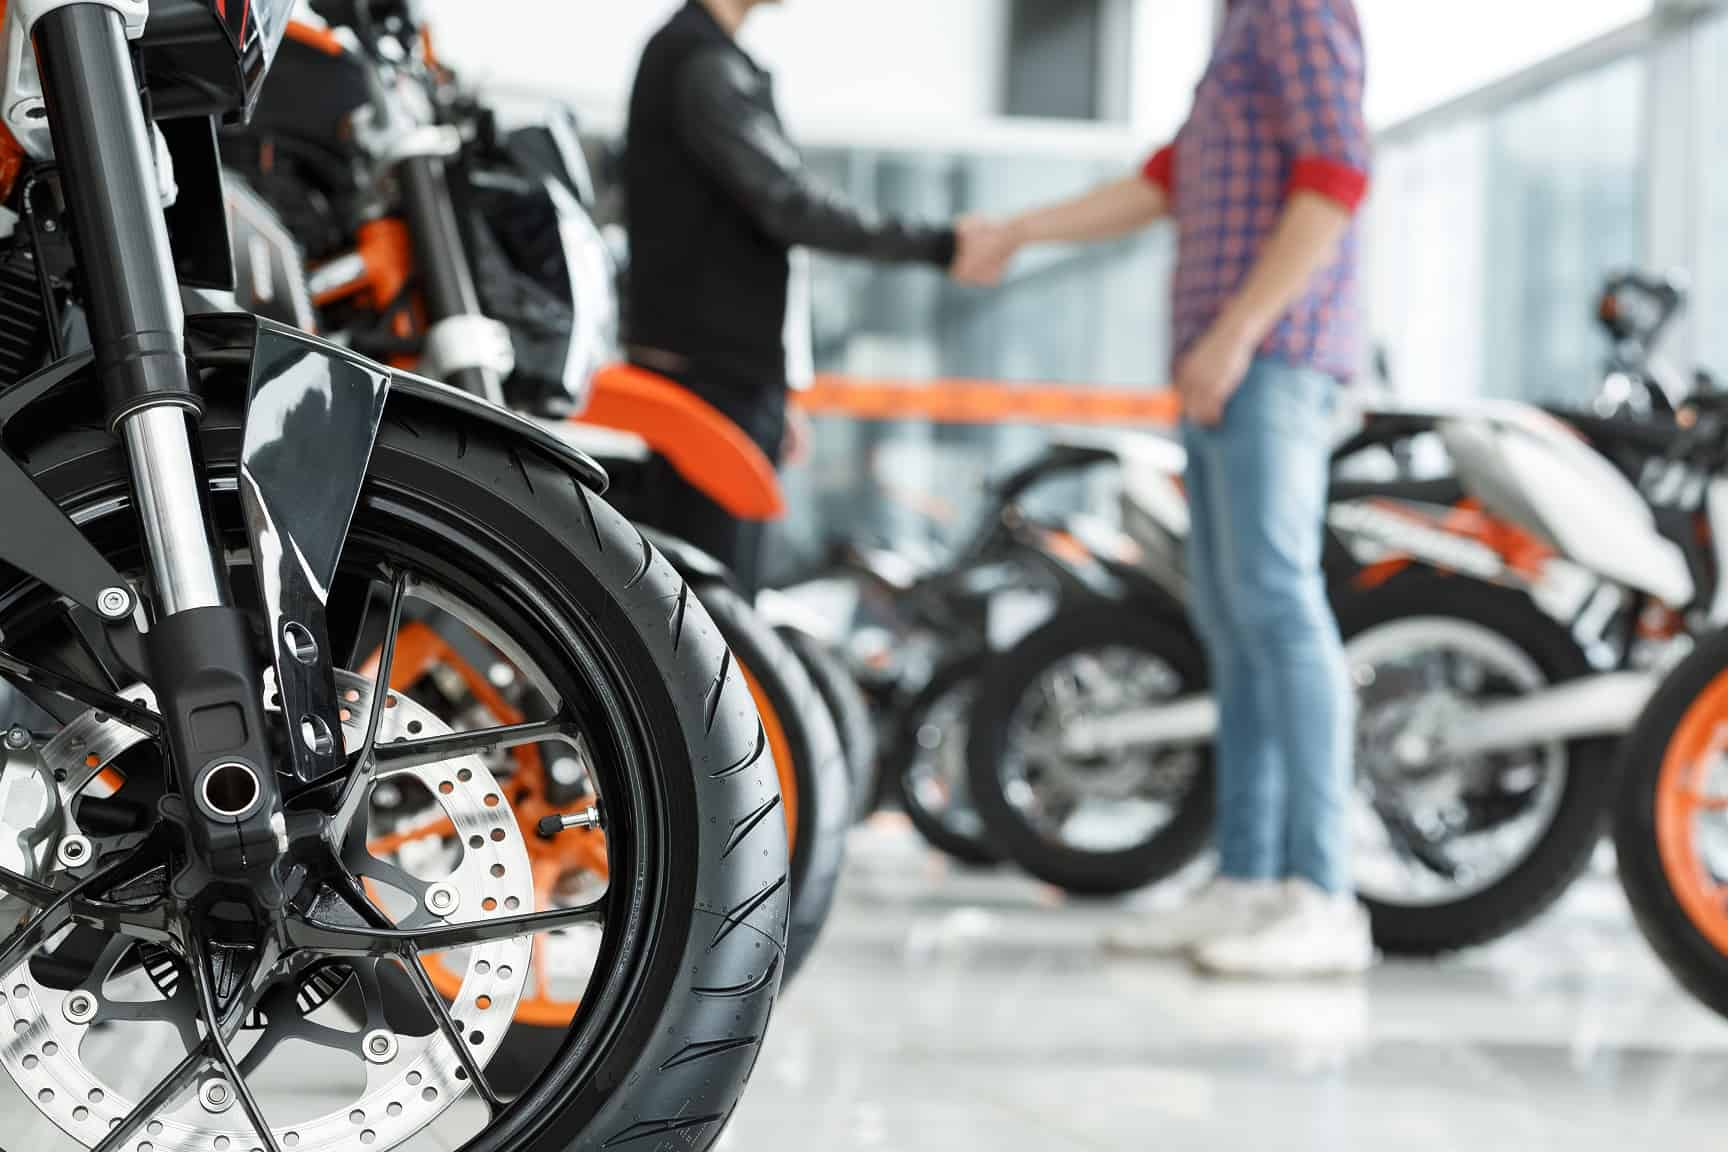 постановка на учет мотоцикла